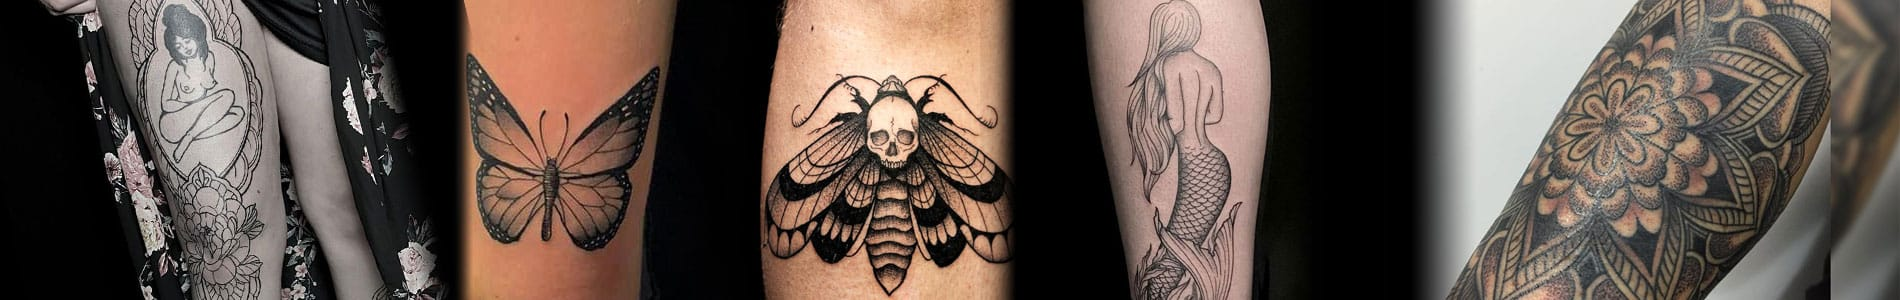 Blackwork tattoo banner